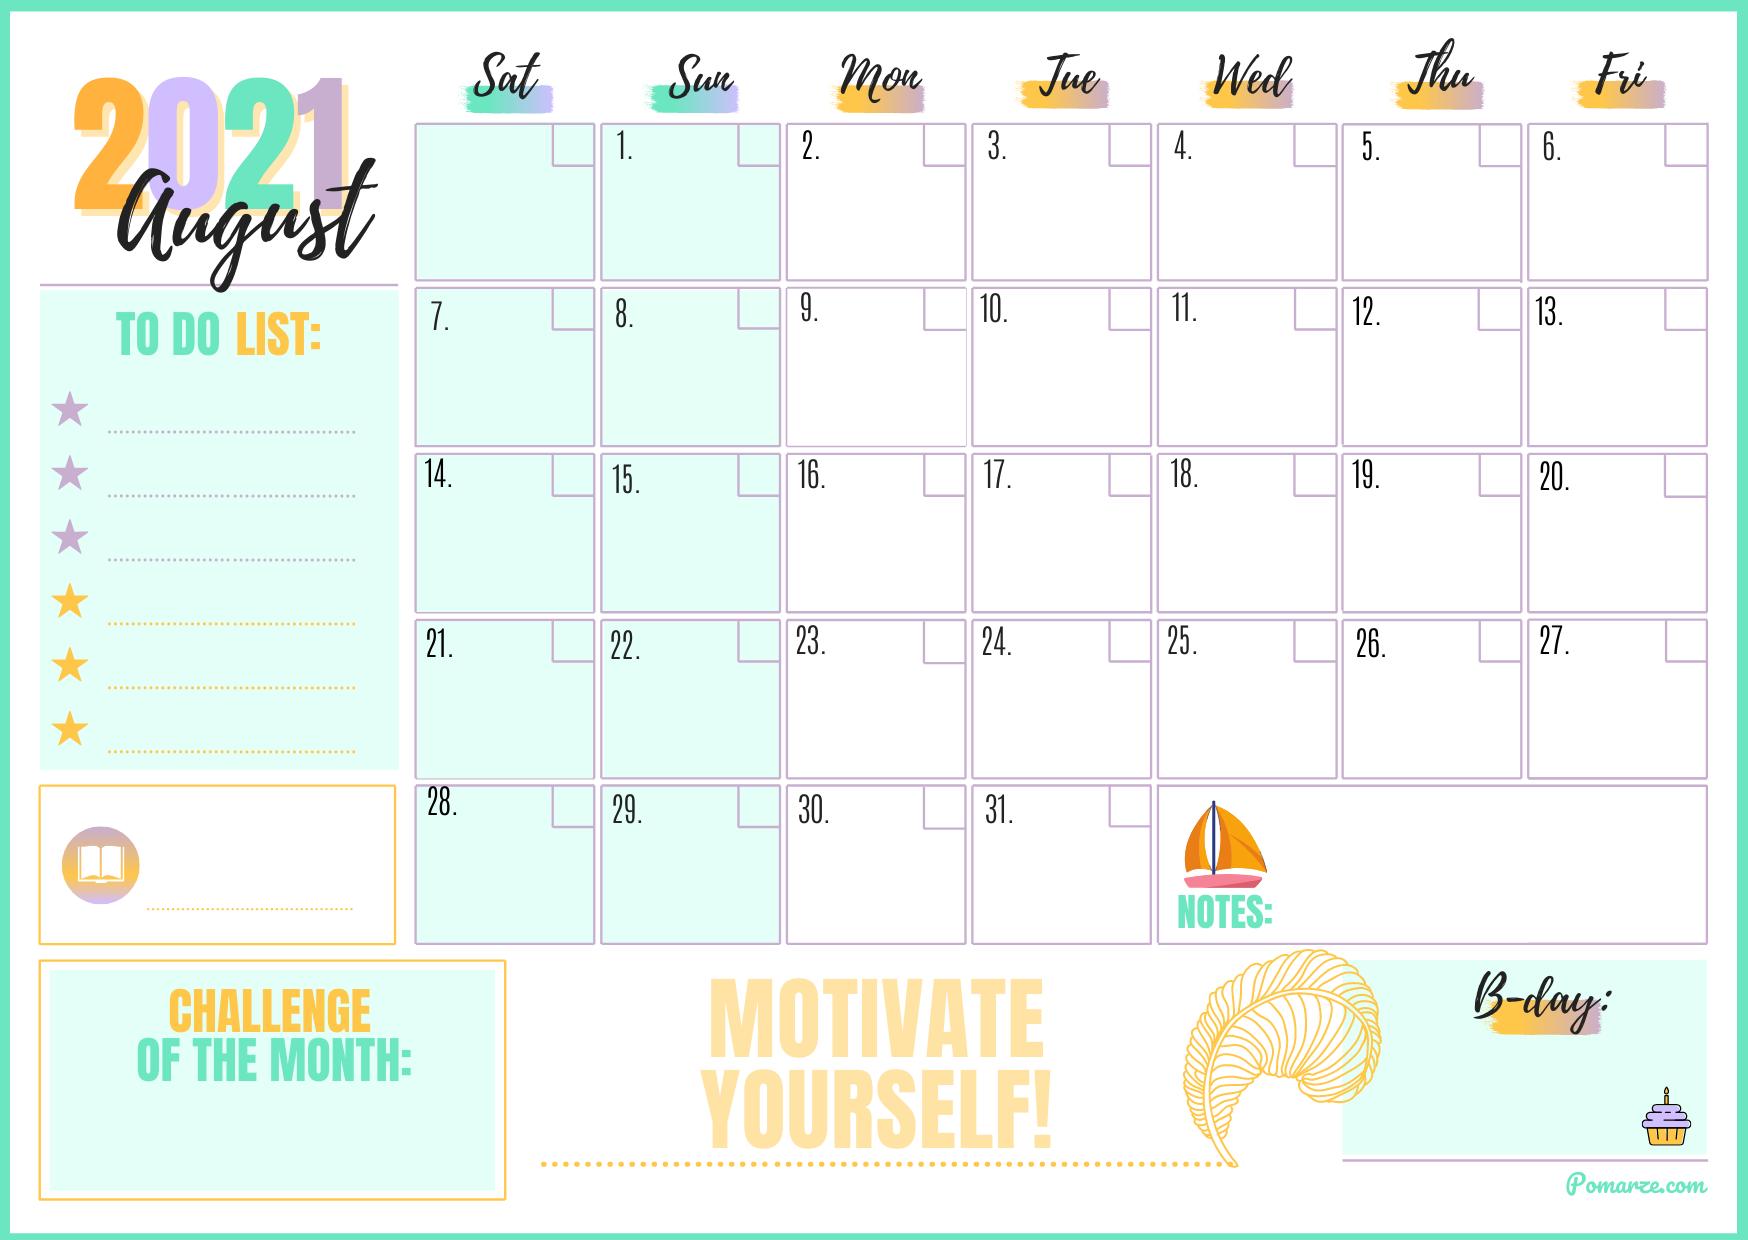 August 2021 monthly calendar weekly planner printable blue